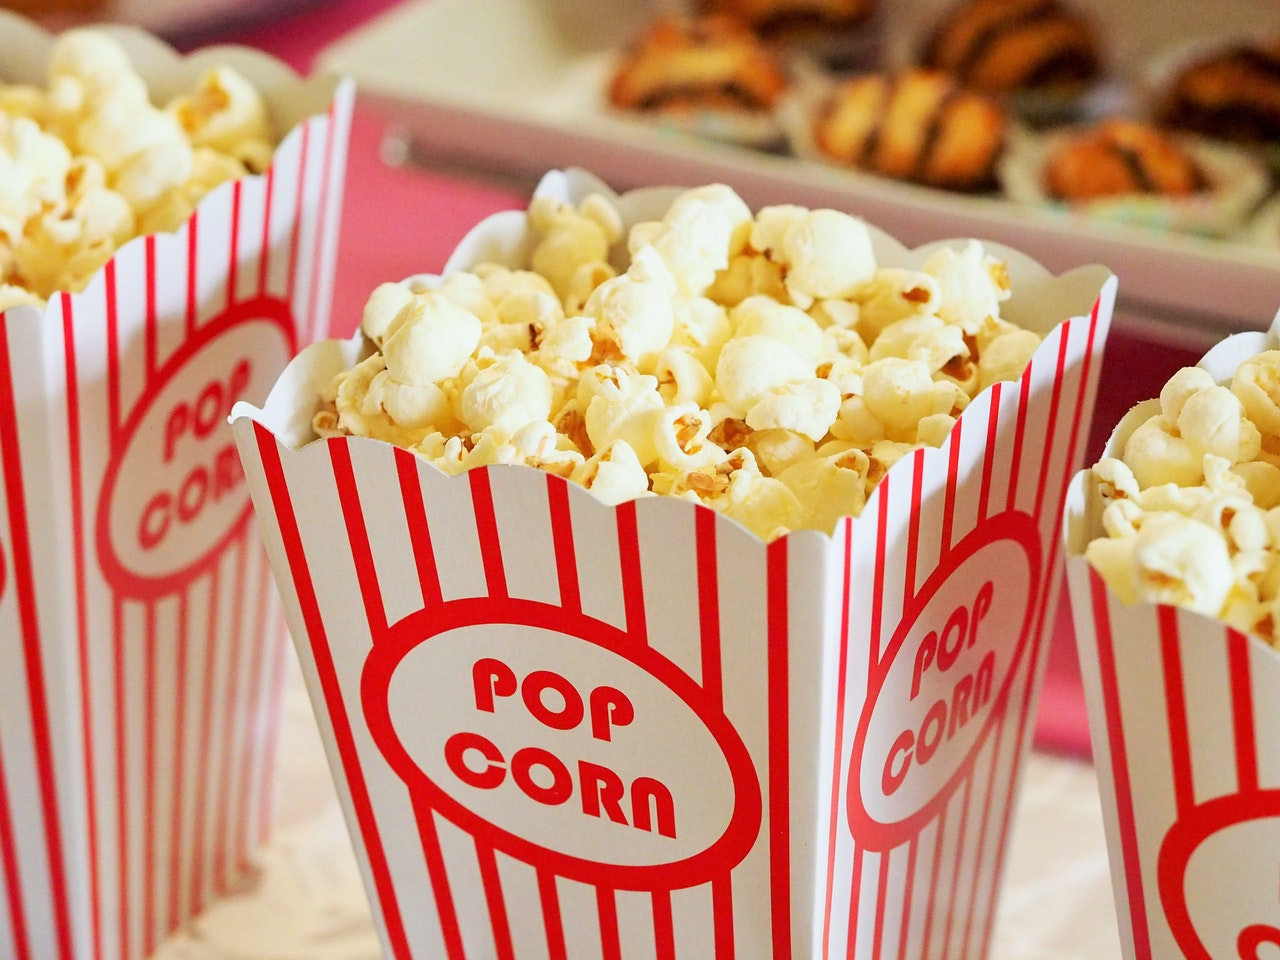 Movie popcorn, ready to go